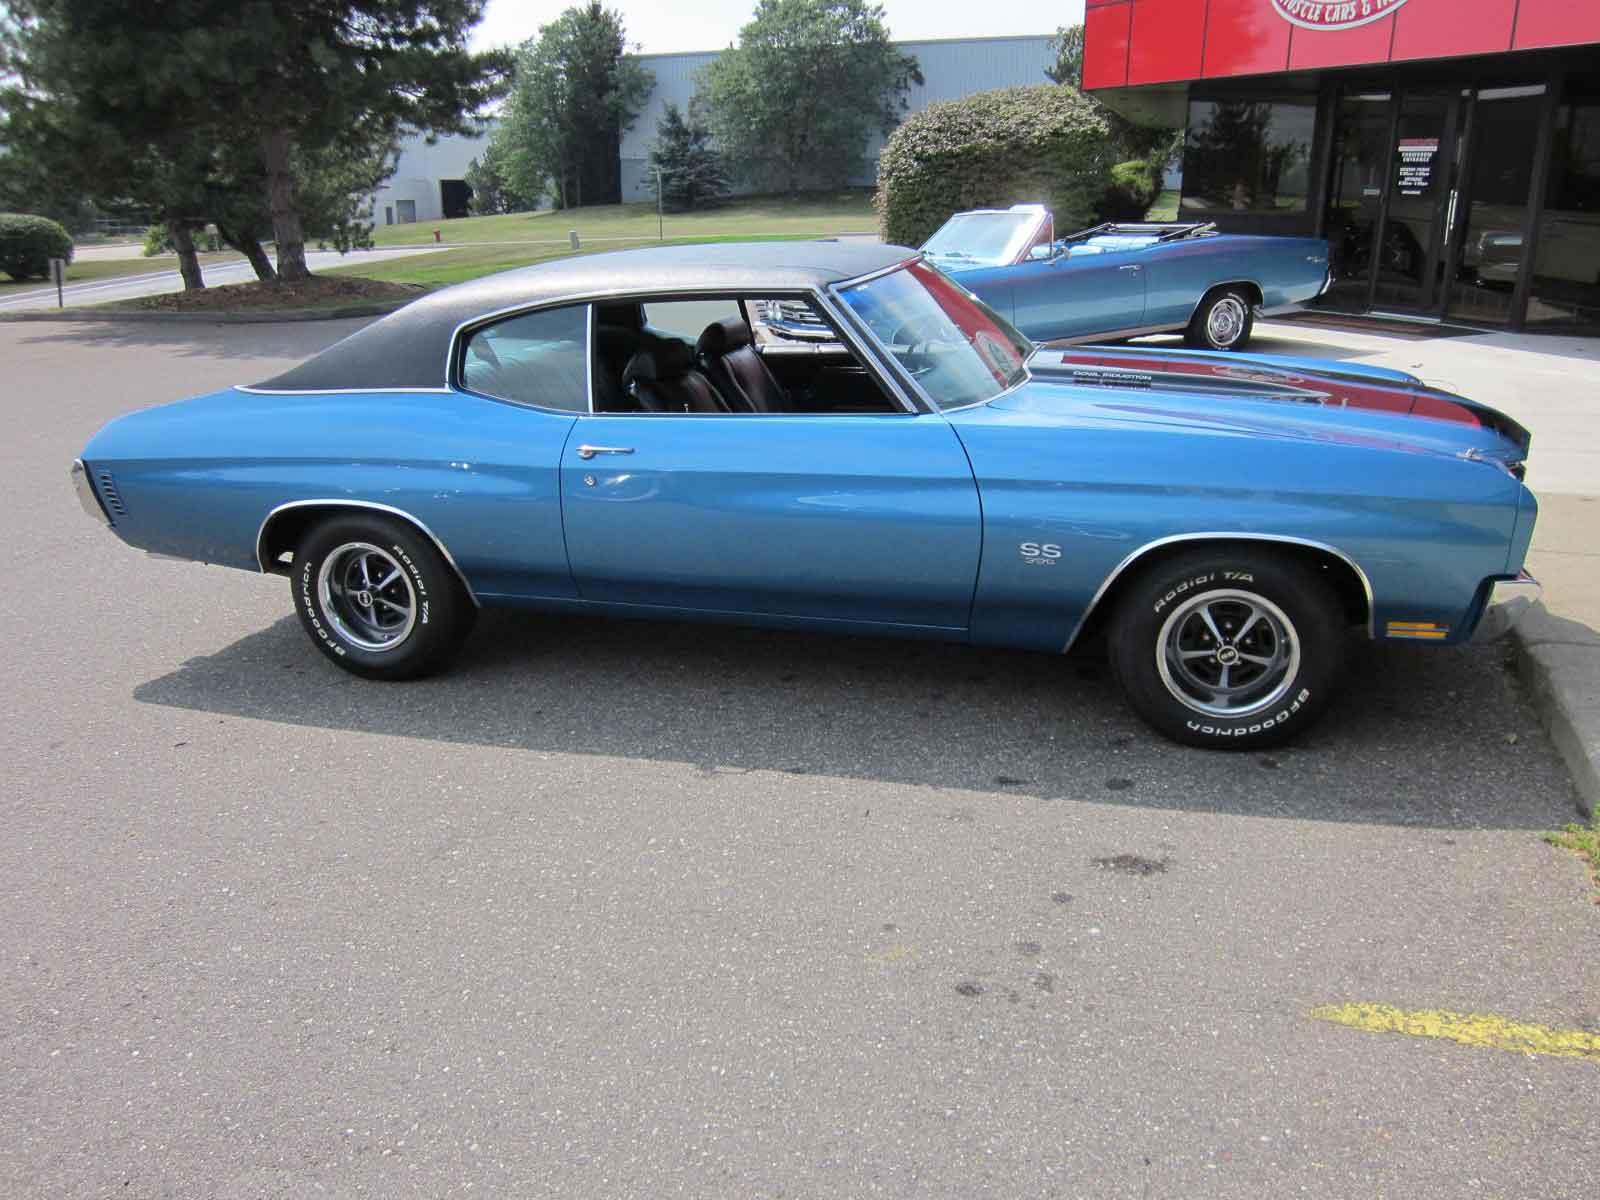 Calgary Police seeking public help to locate a stolen classic car